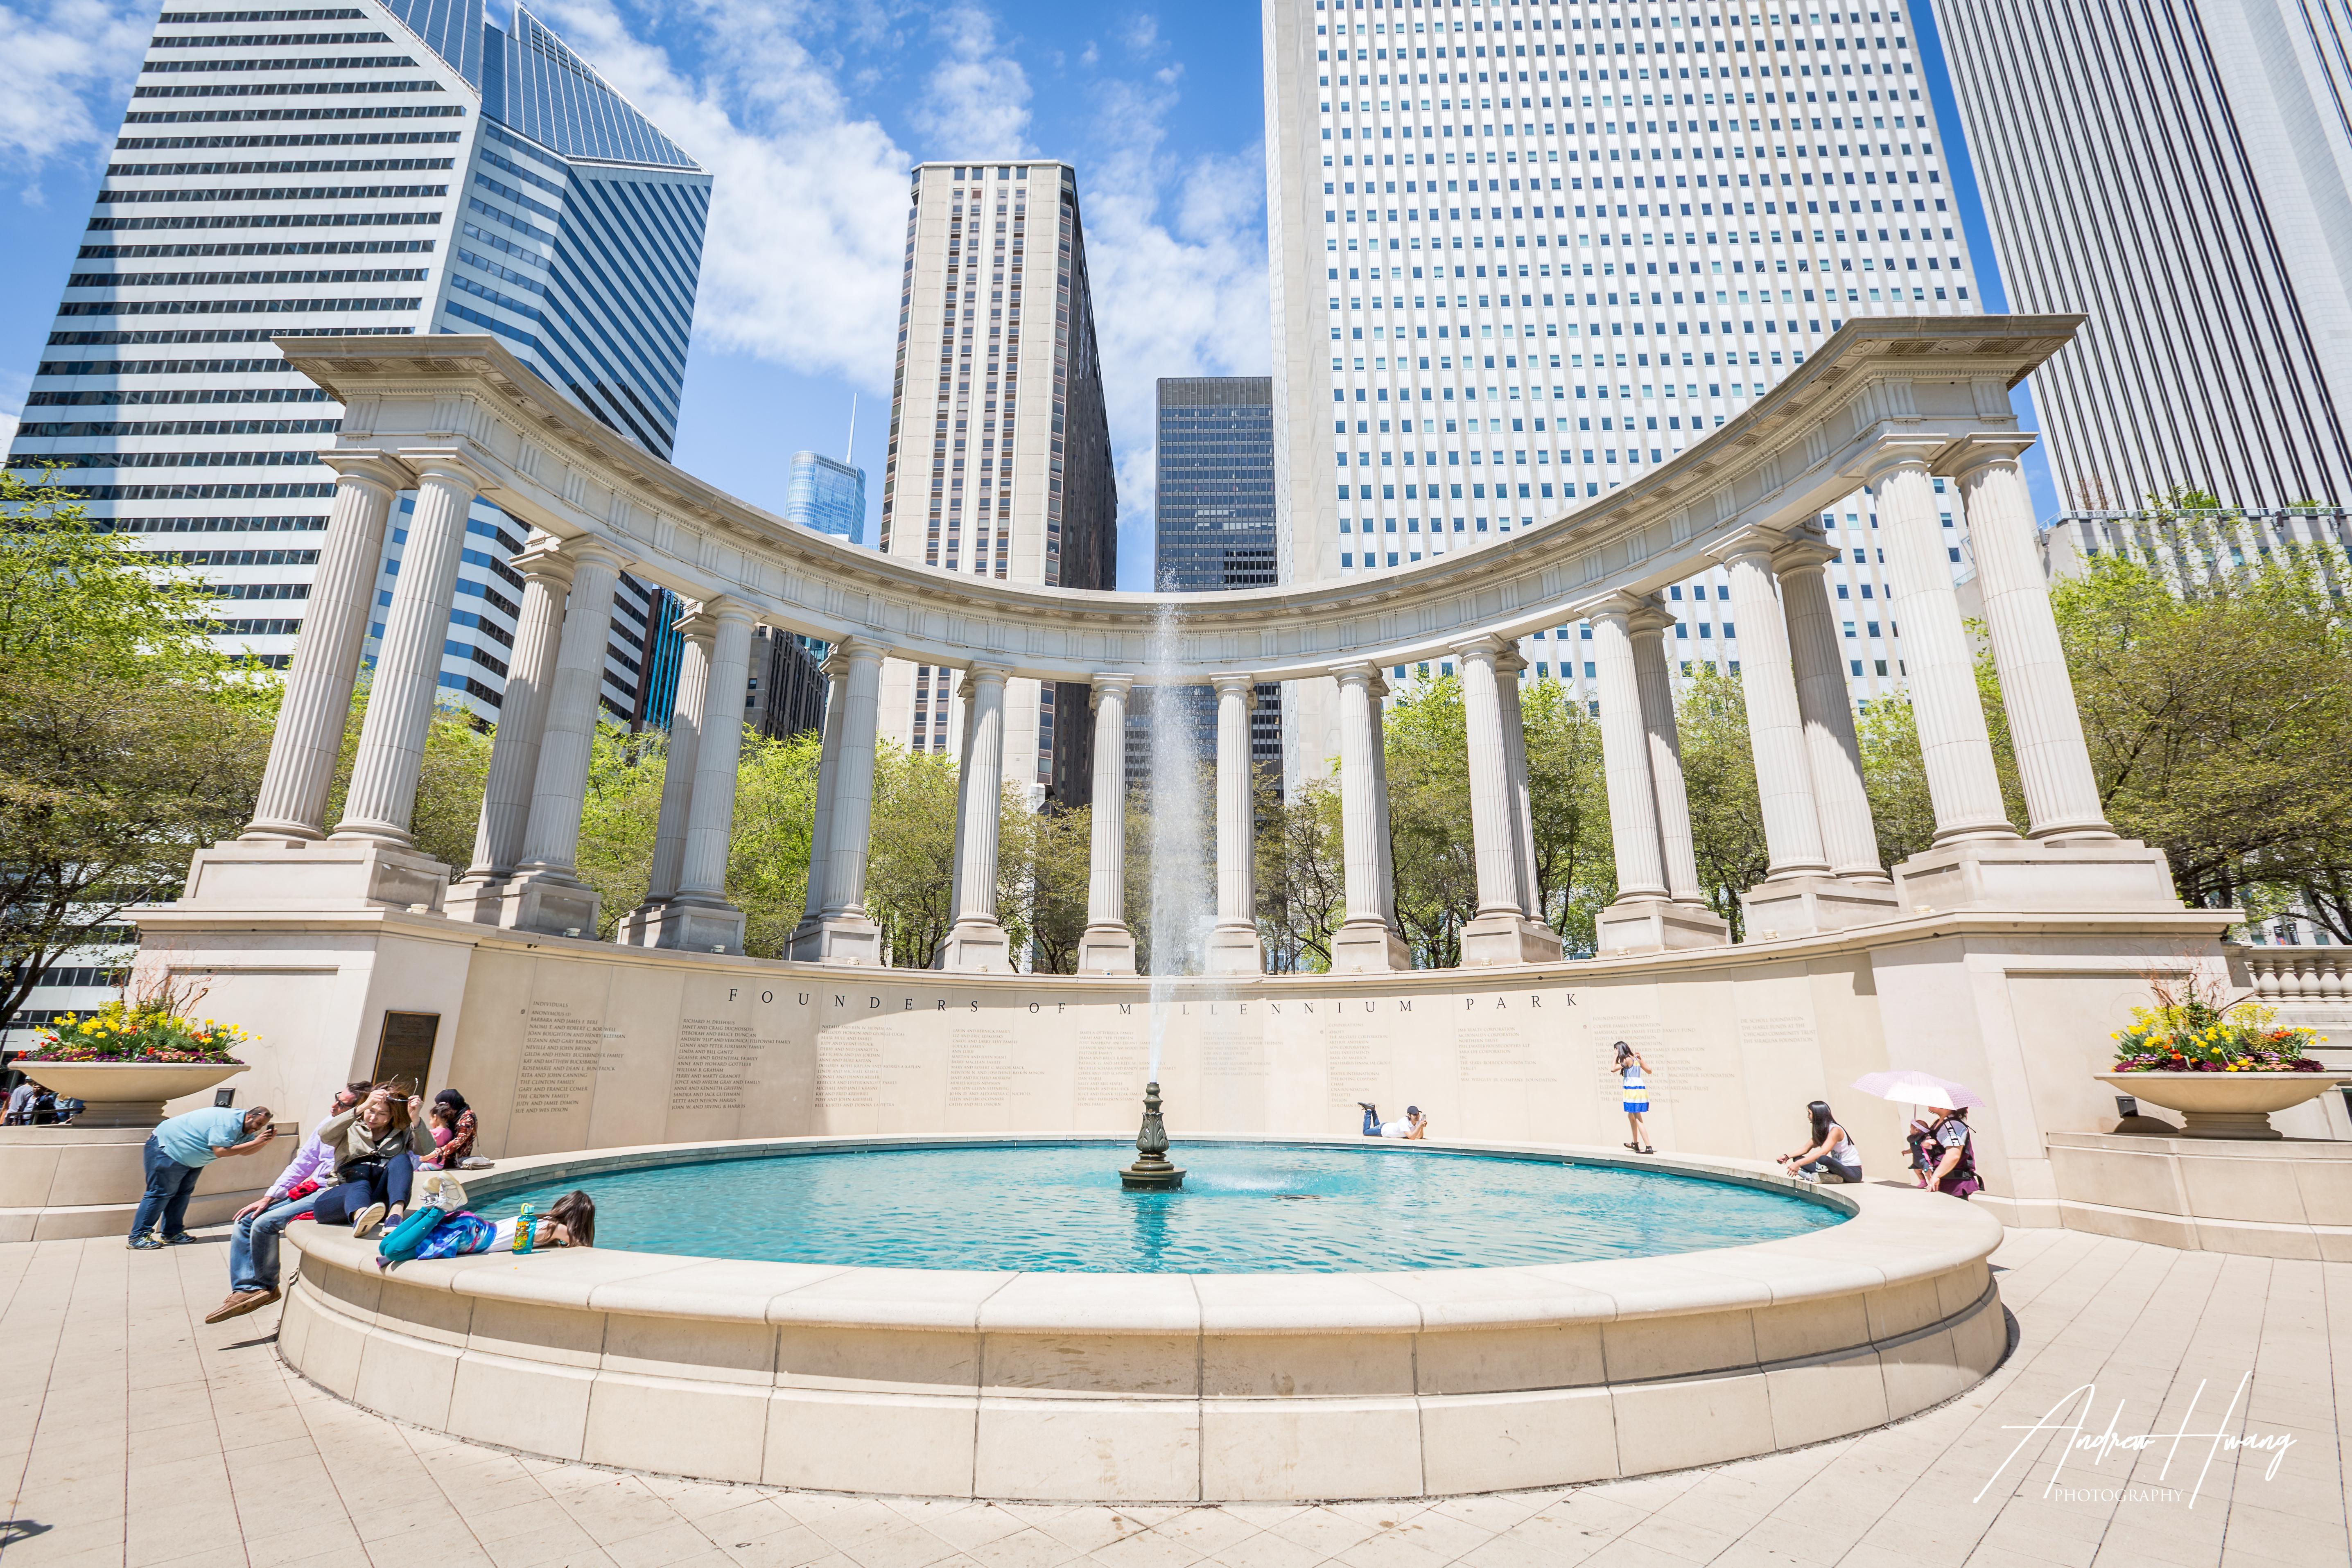 Founders of Millennium Park Chicago